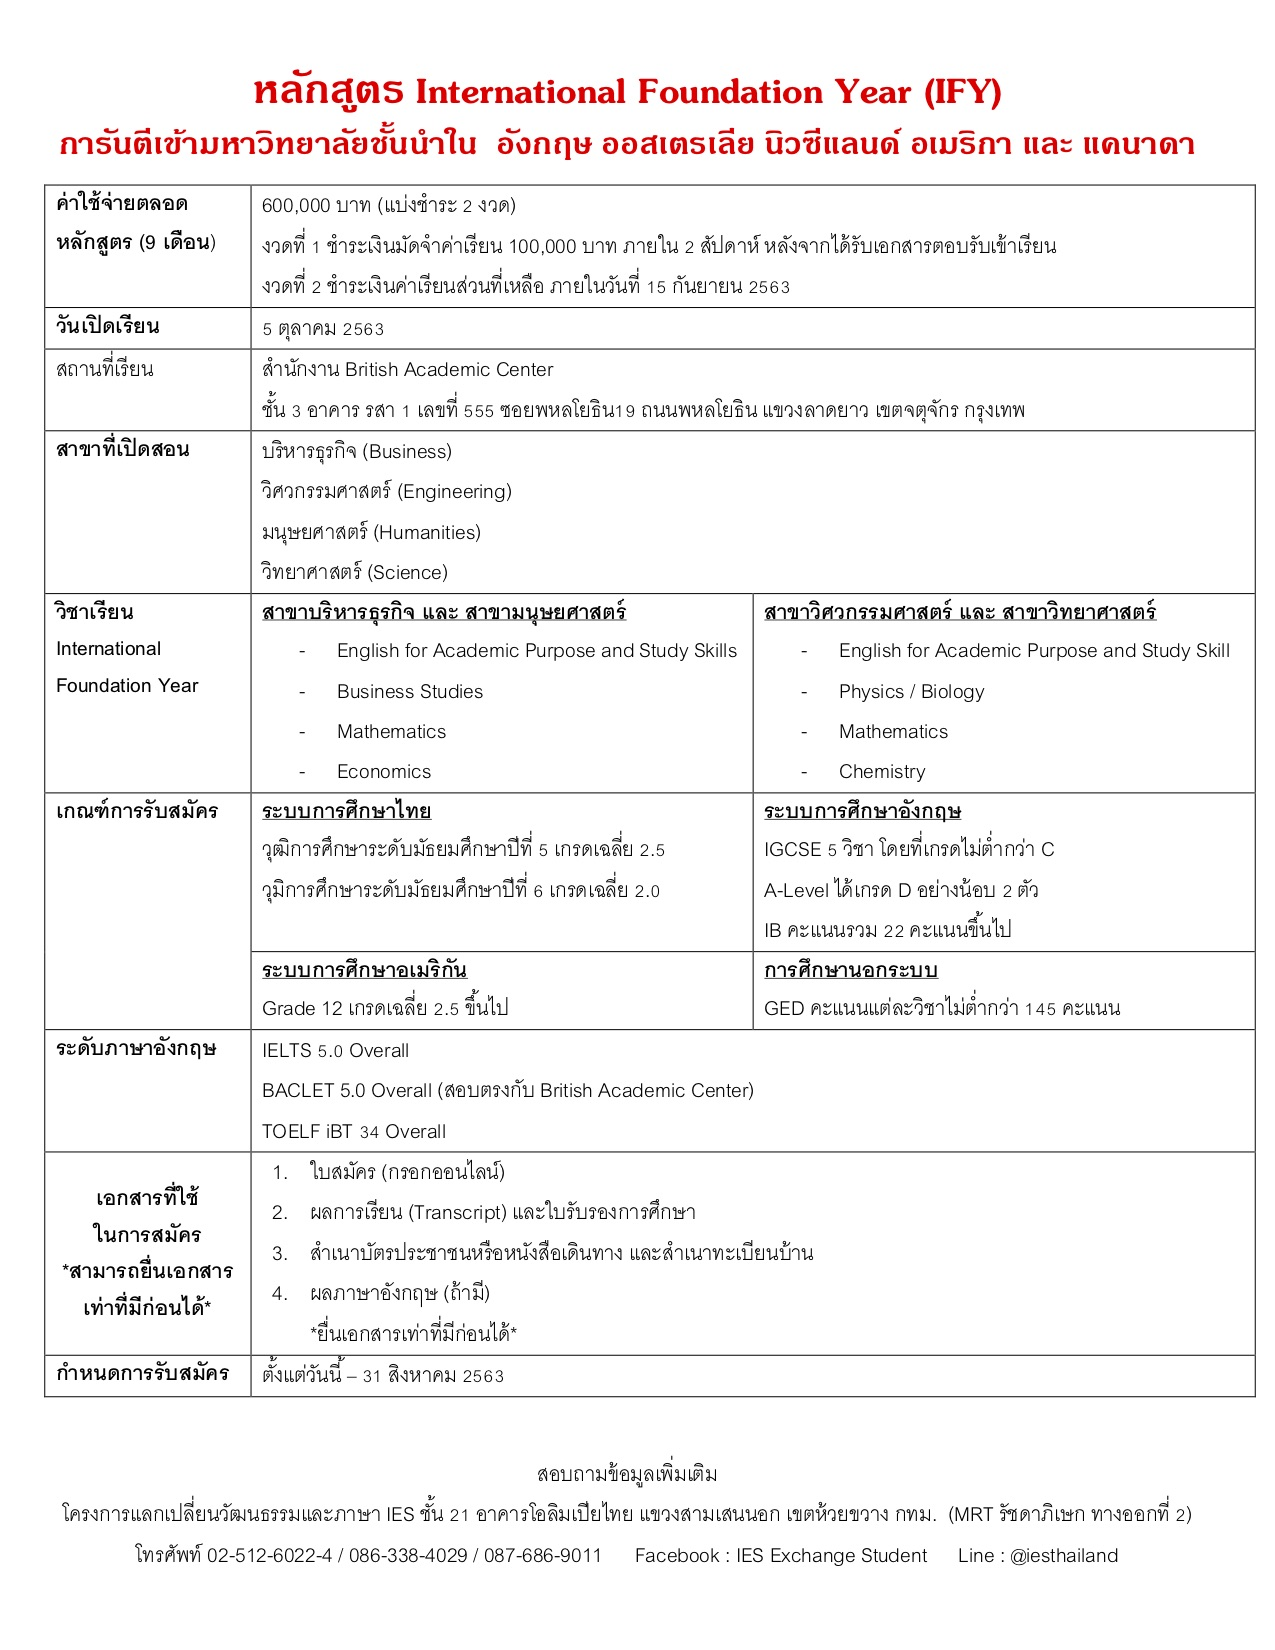 IFY Information-3